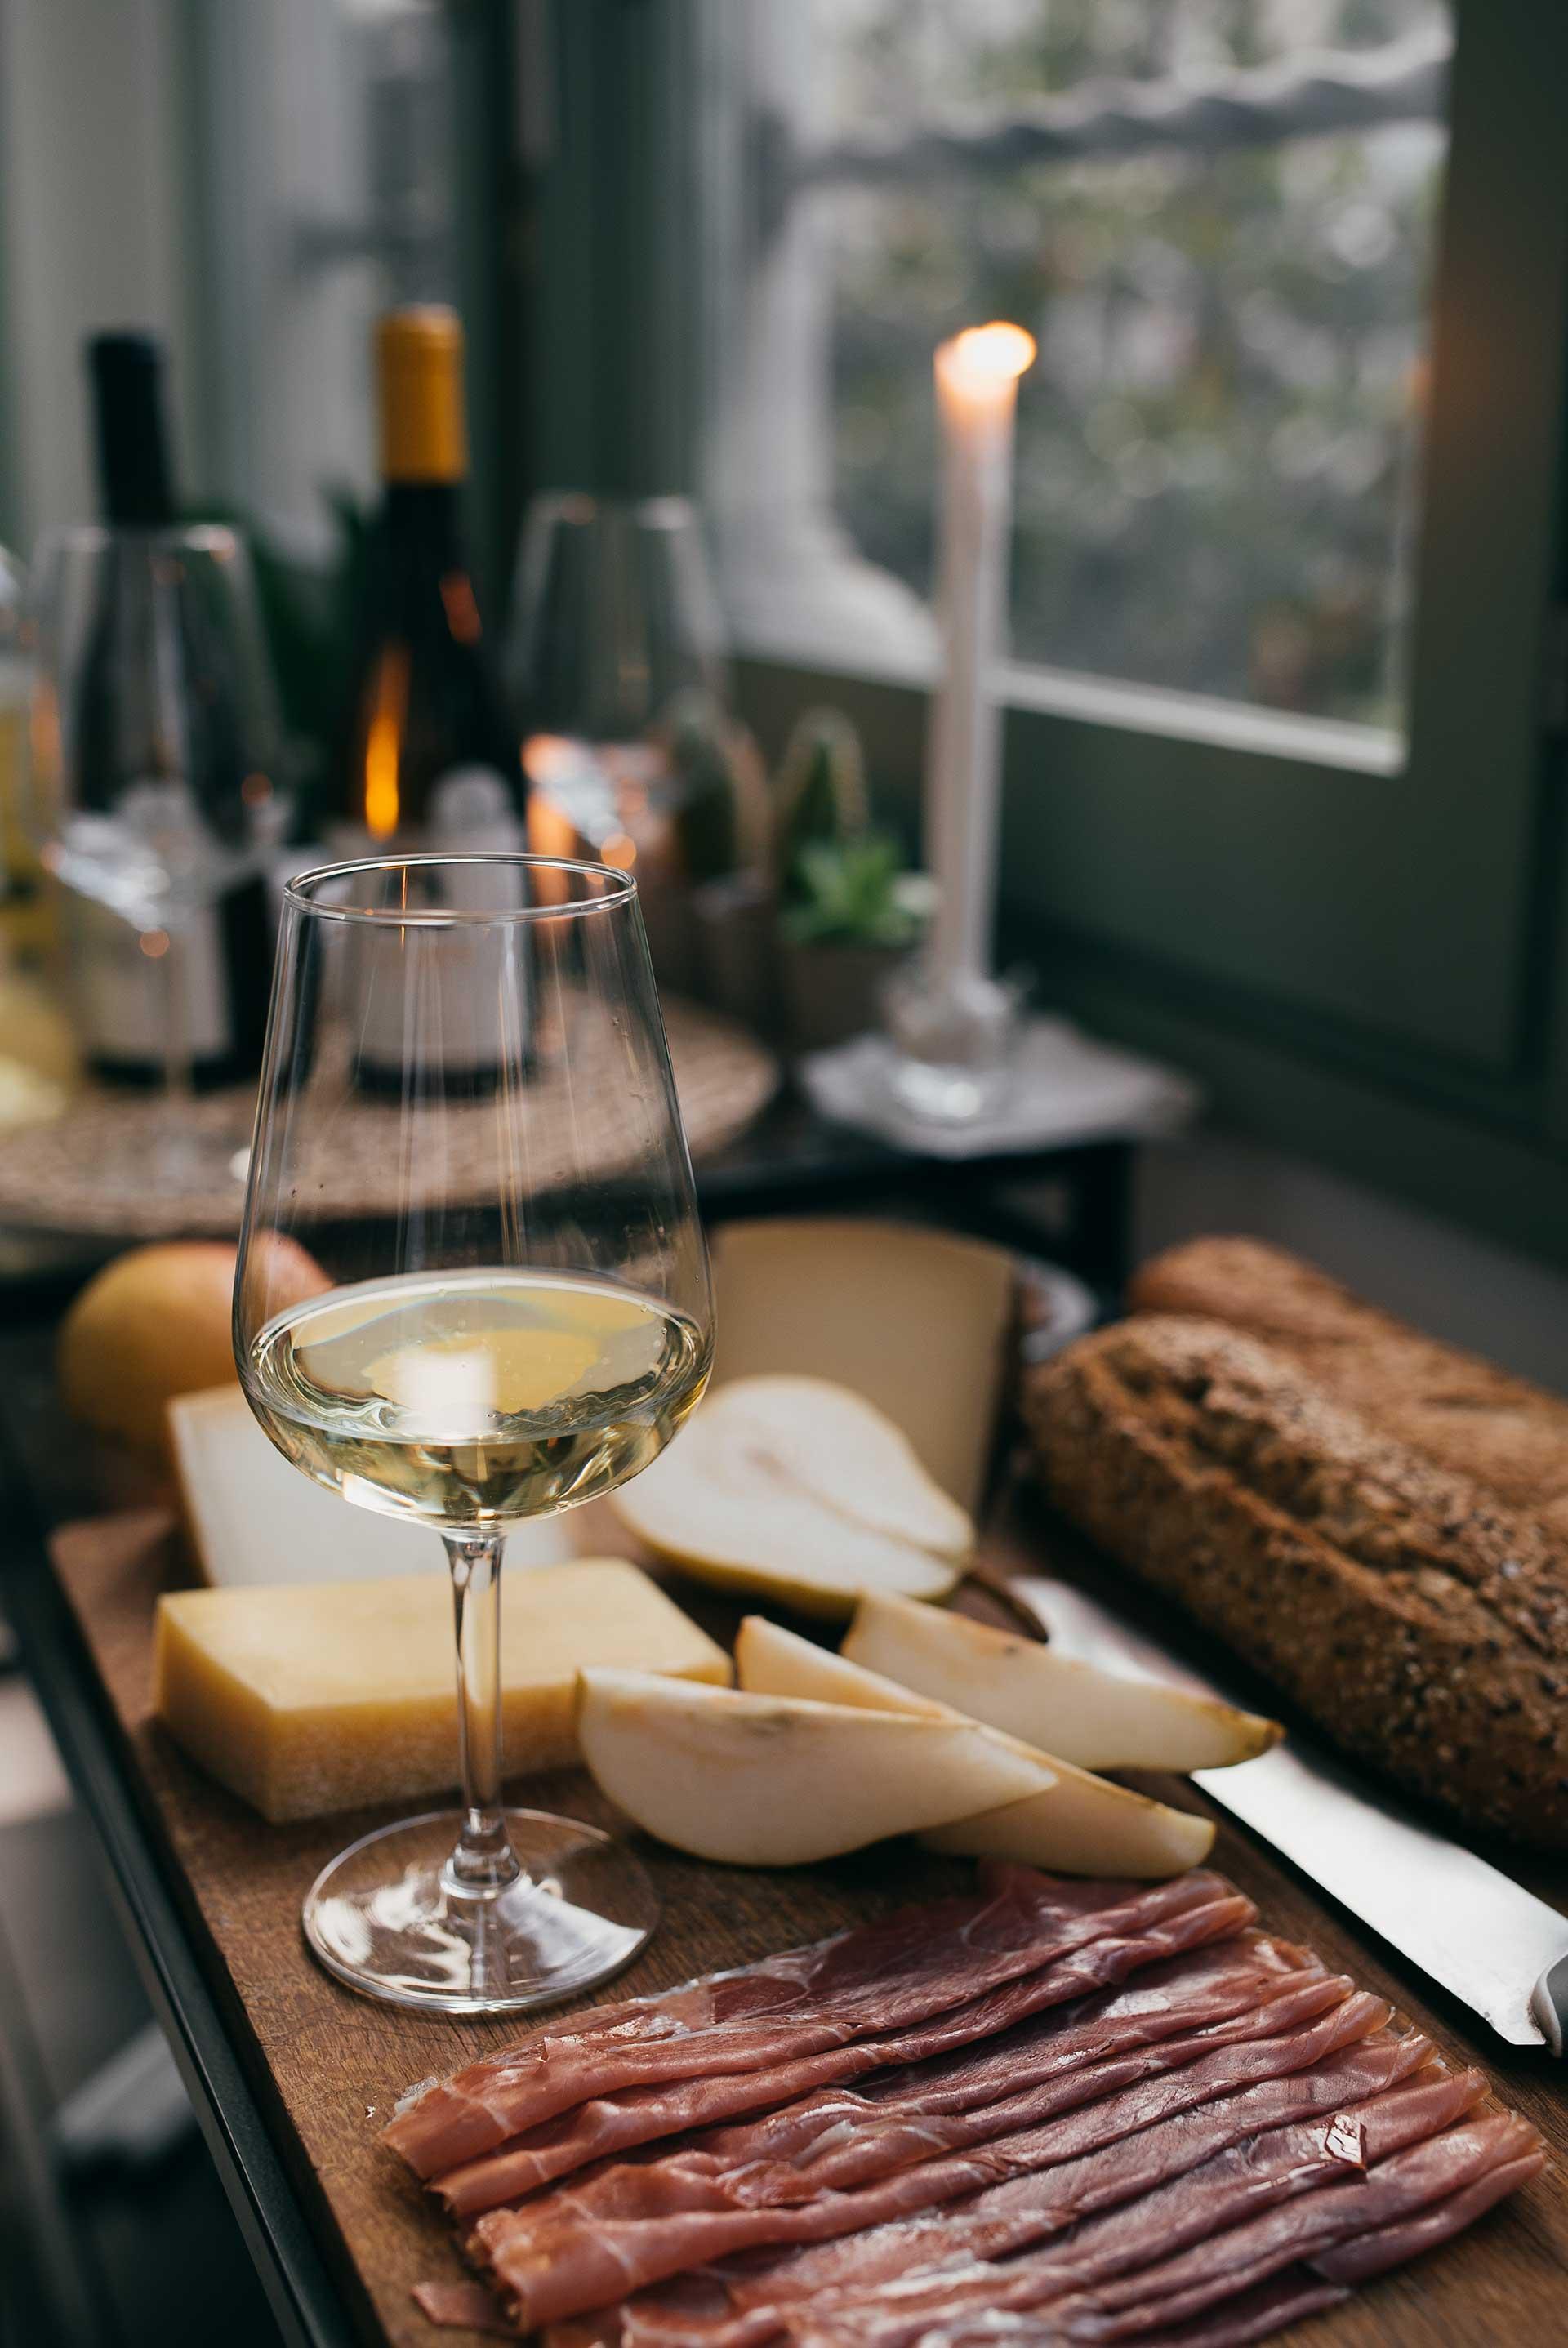 DSTN-photos-lifestyle-wine-2.jpg